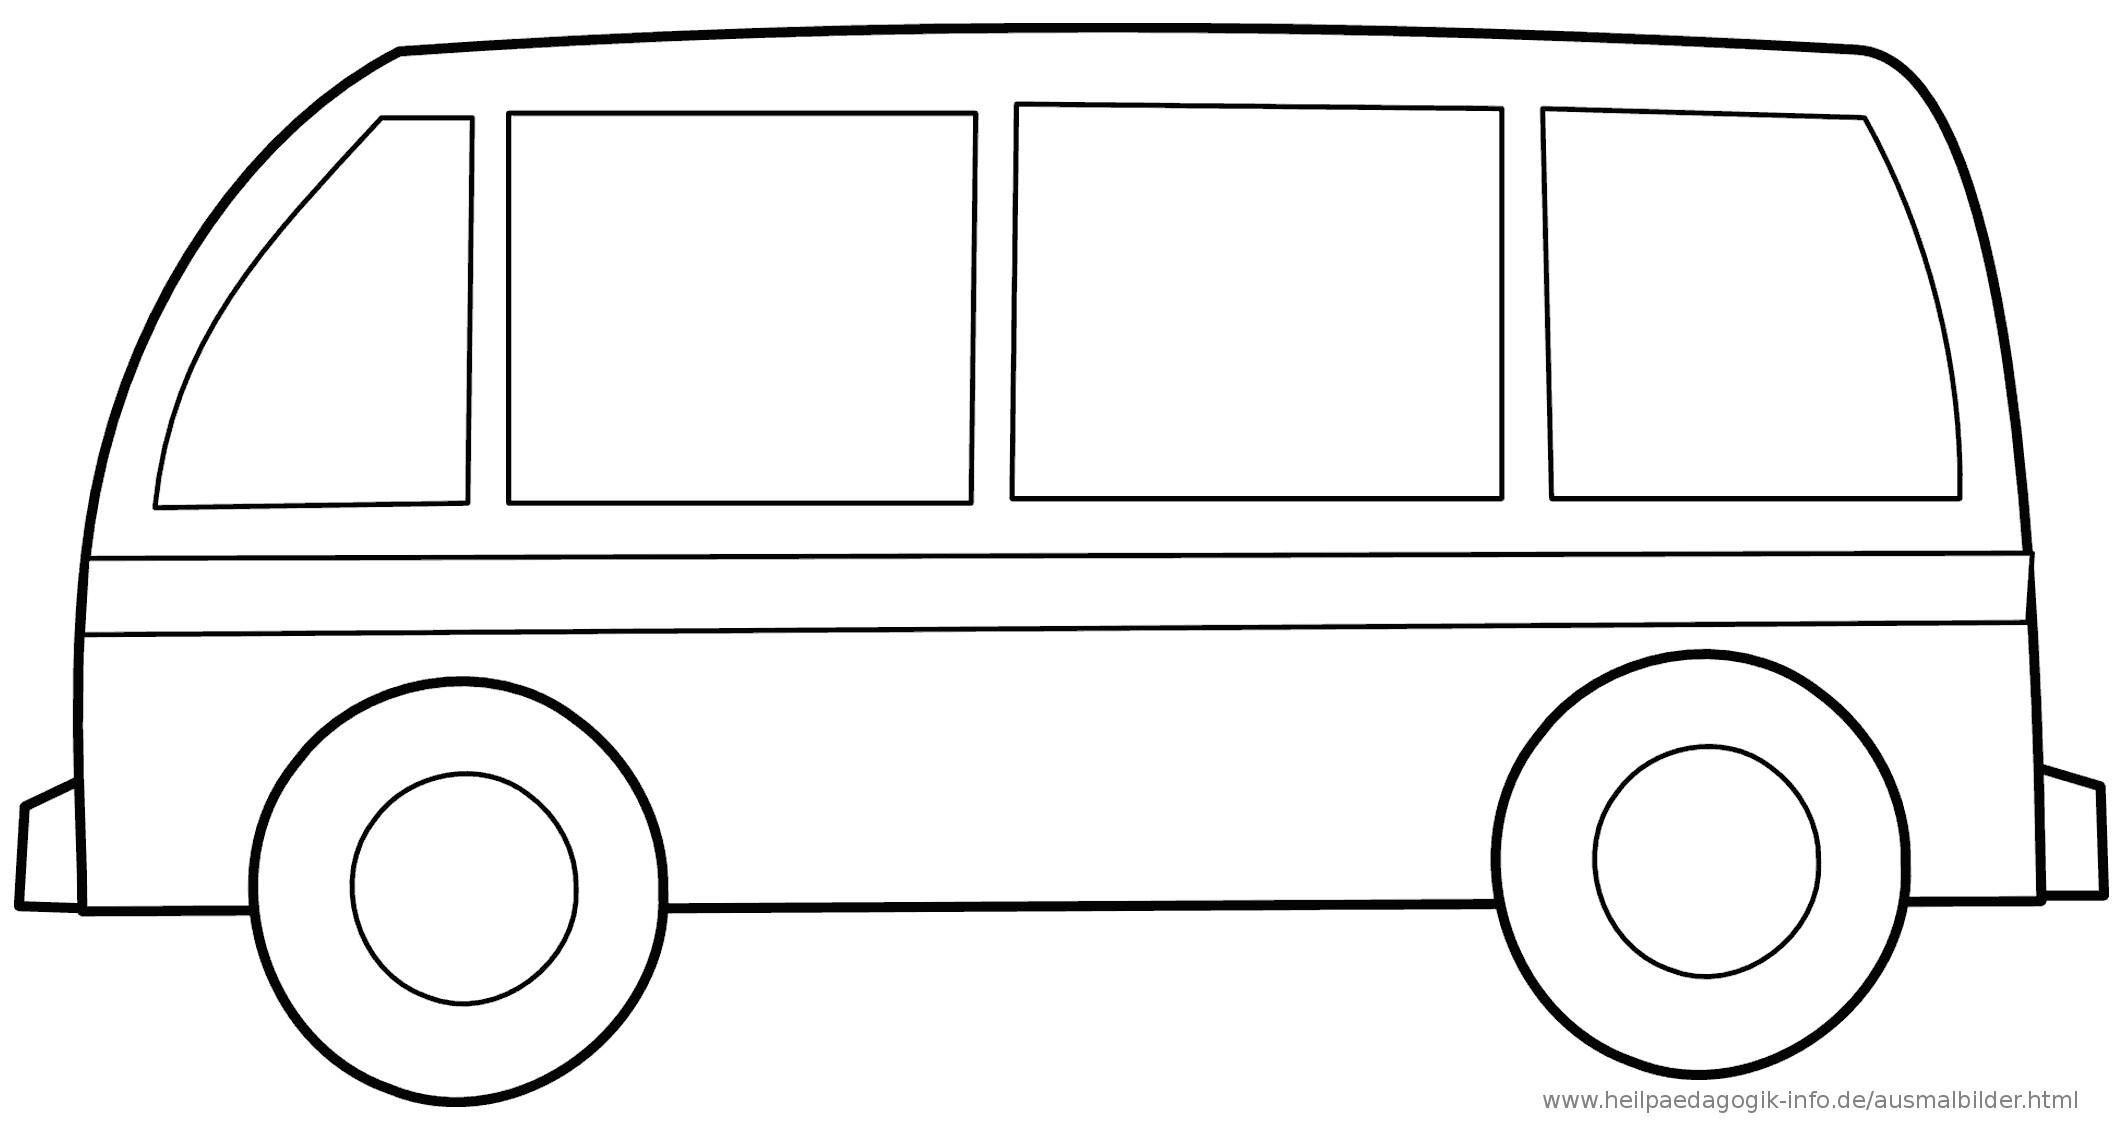 Ausmalbilder Bus  Ausmalbilder Busse